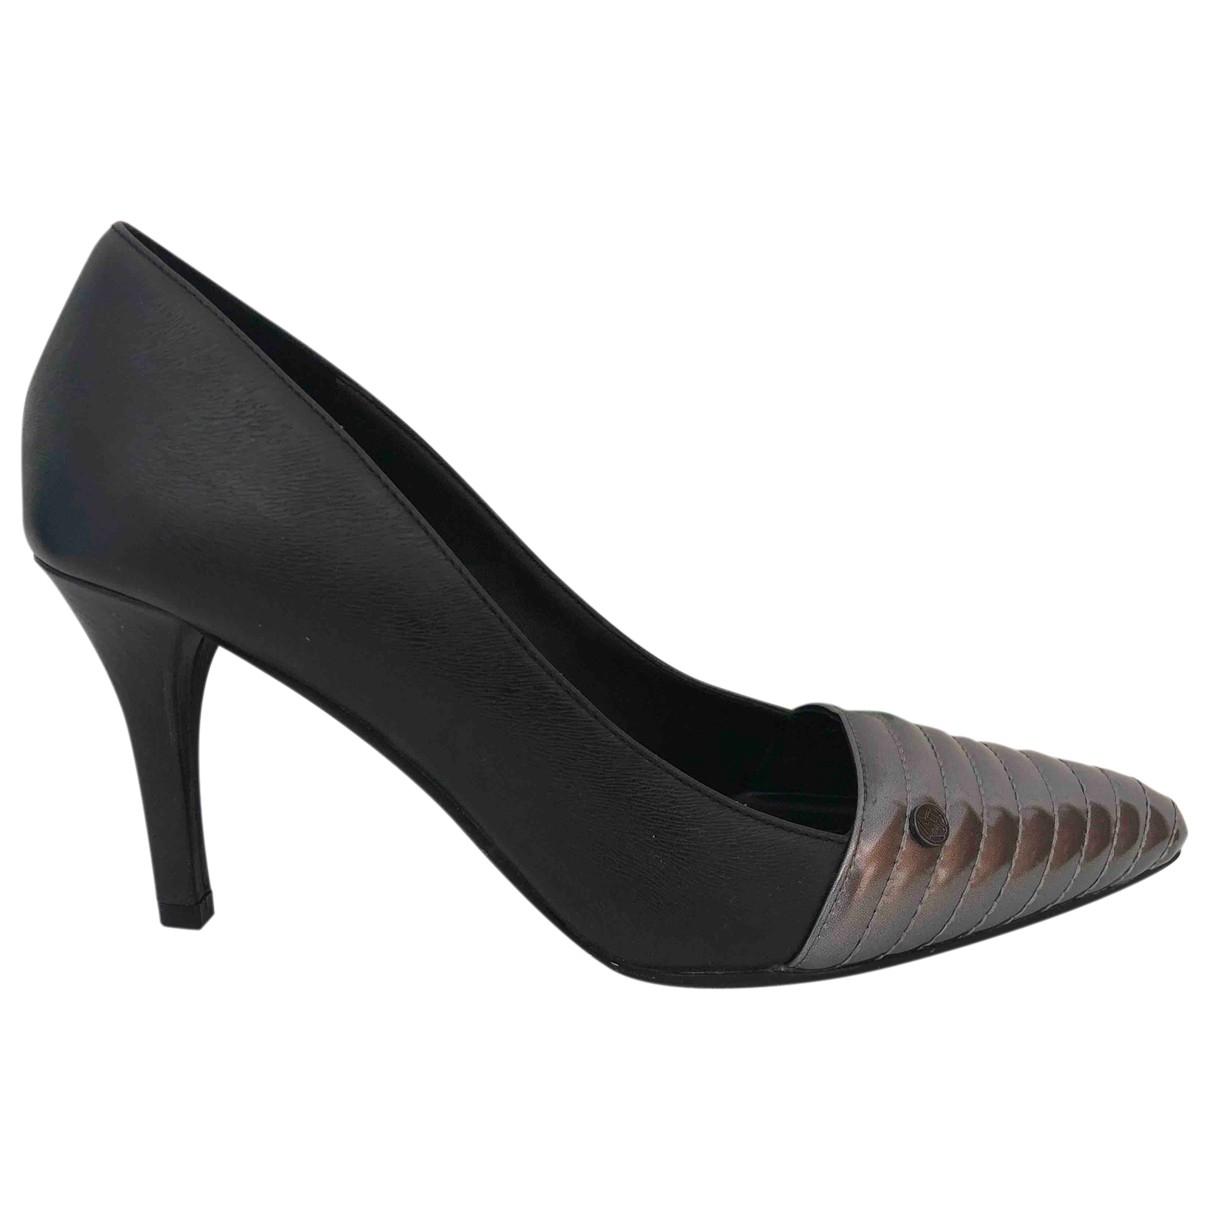 Armani Jeans \N Black Leather Heels for Women 37 EU